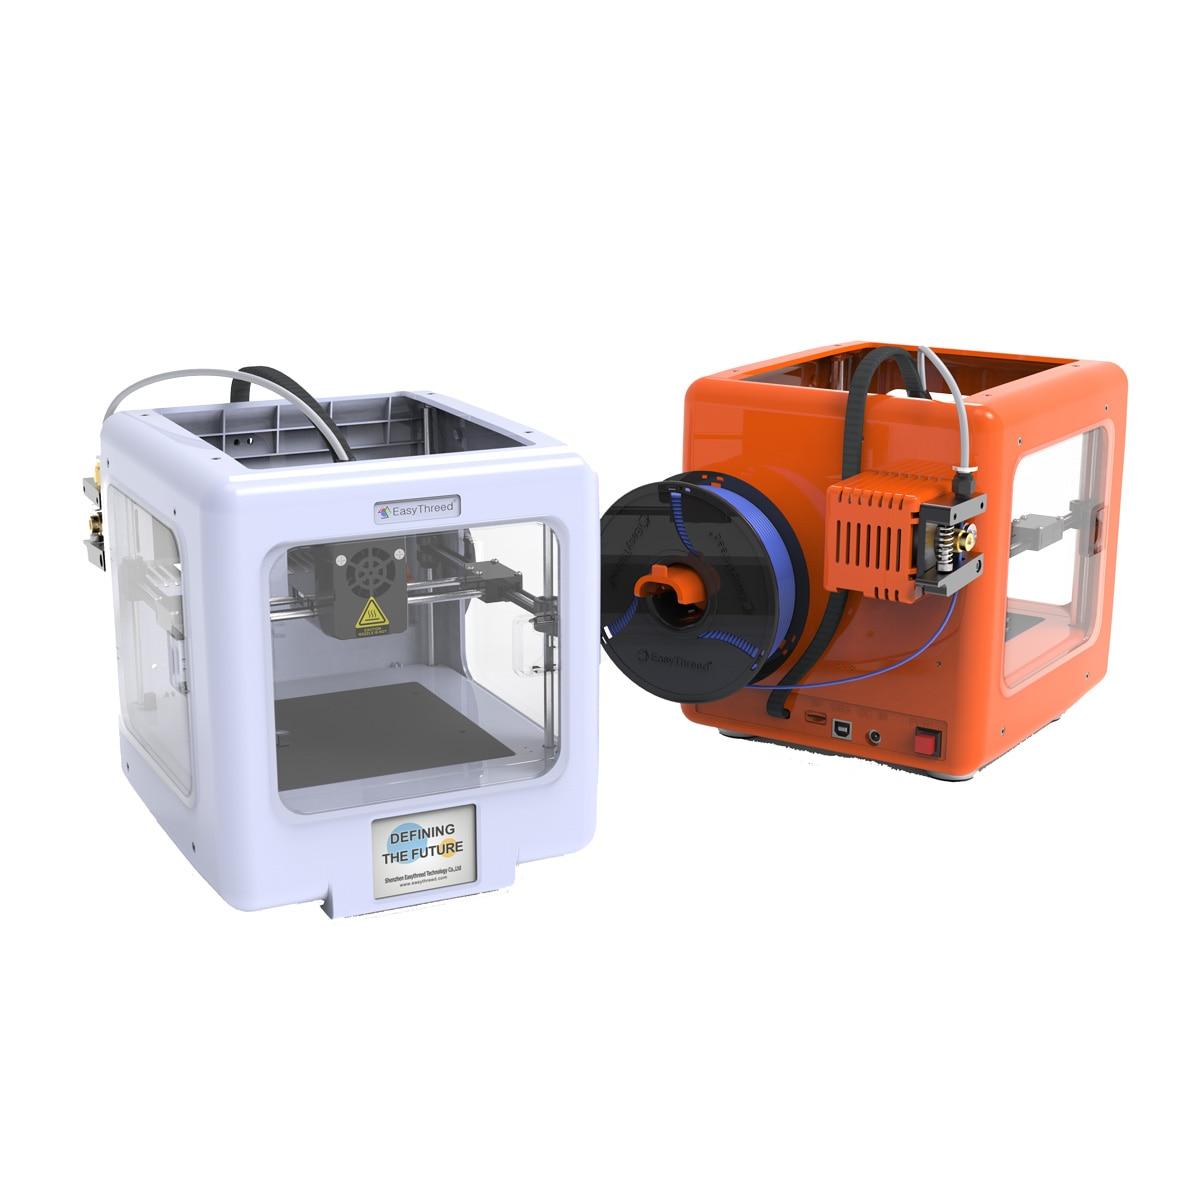 Orange/White Mini Desktop Assembled 3D Printer Support WIFI/APP Control With Removable Magnetic Platform 90x100x110mm Size